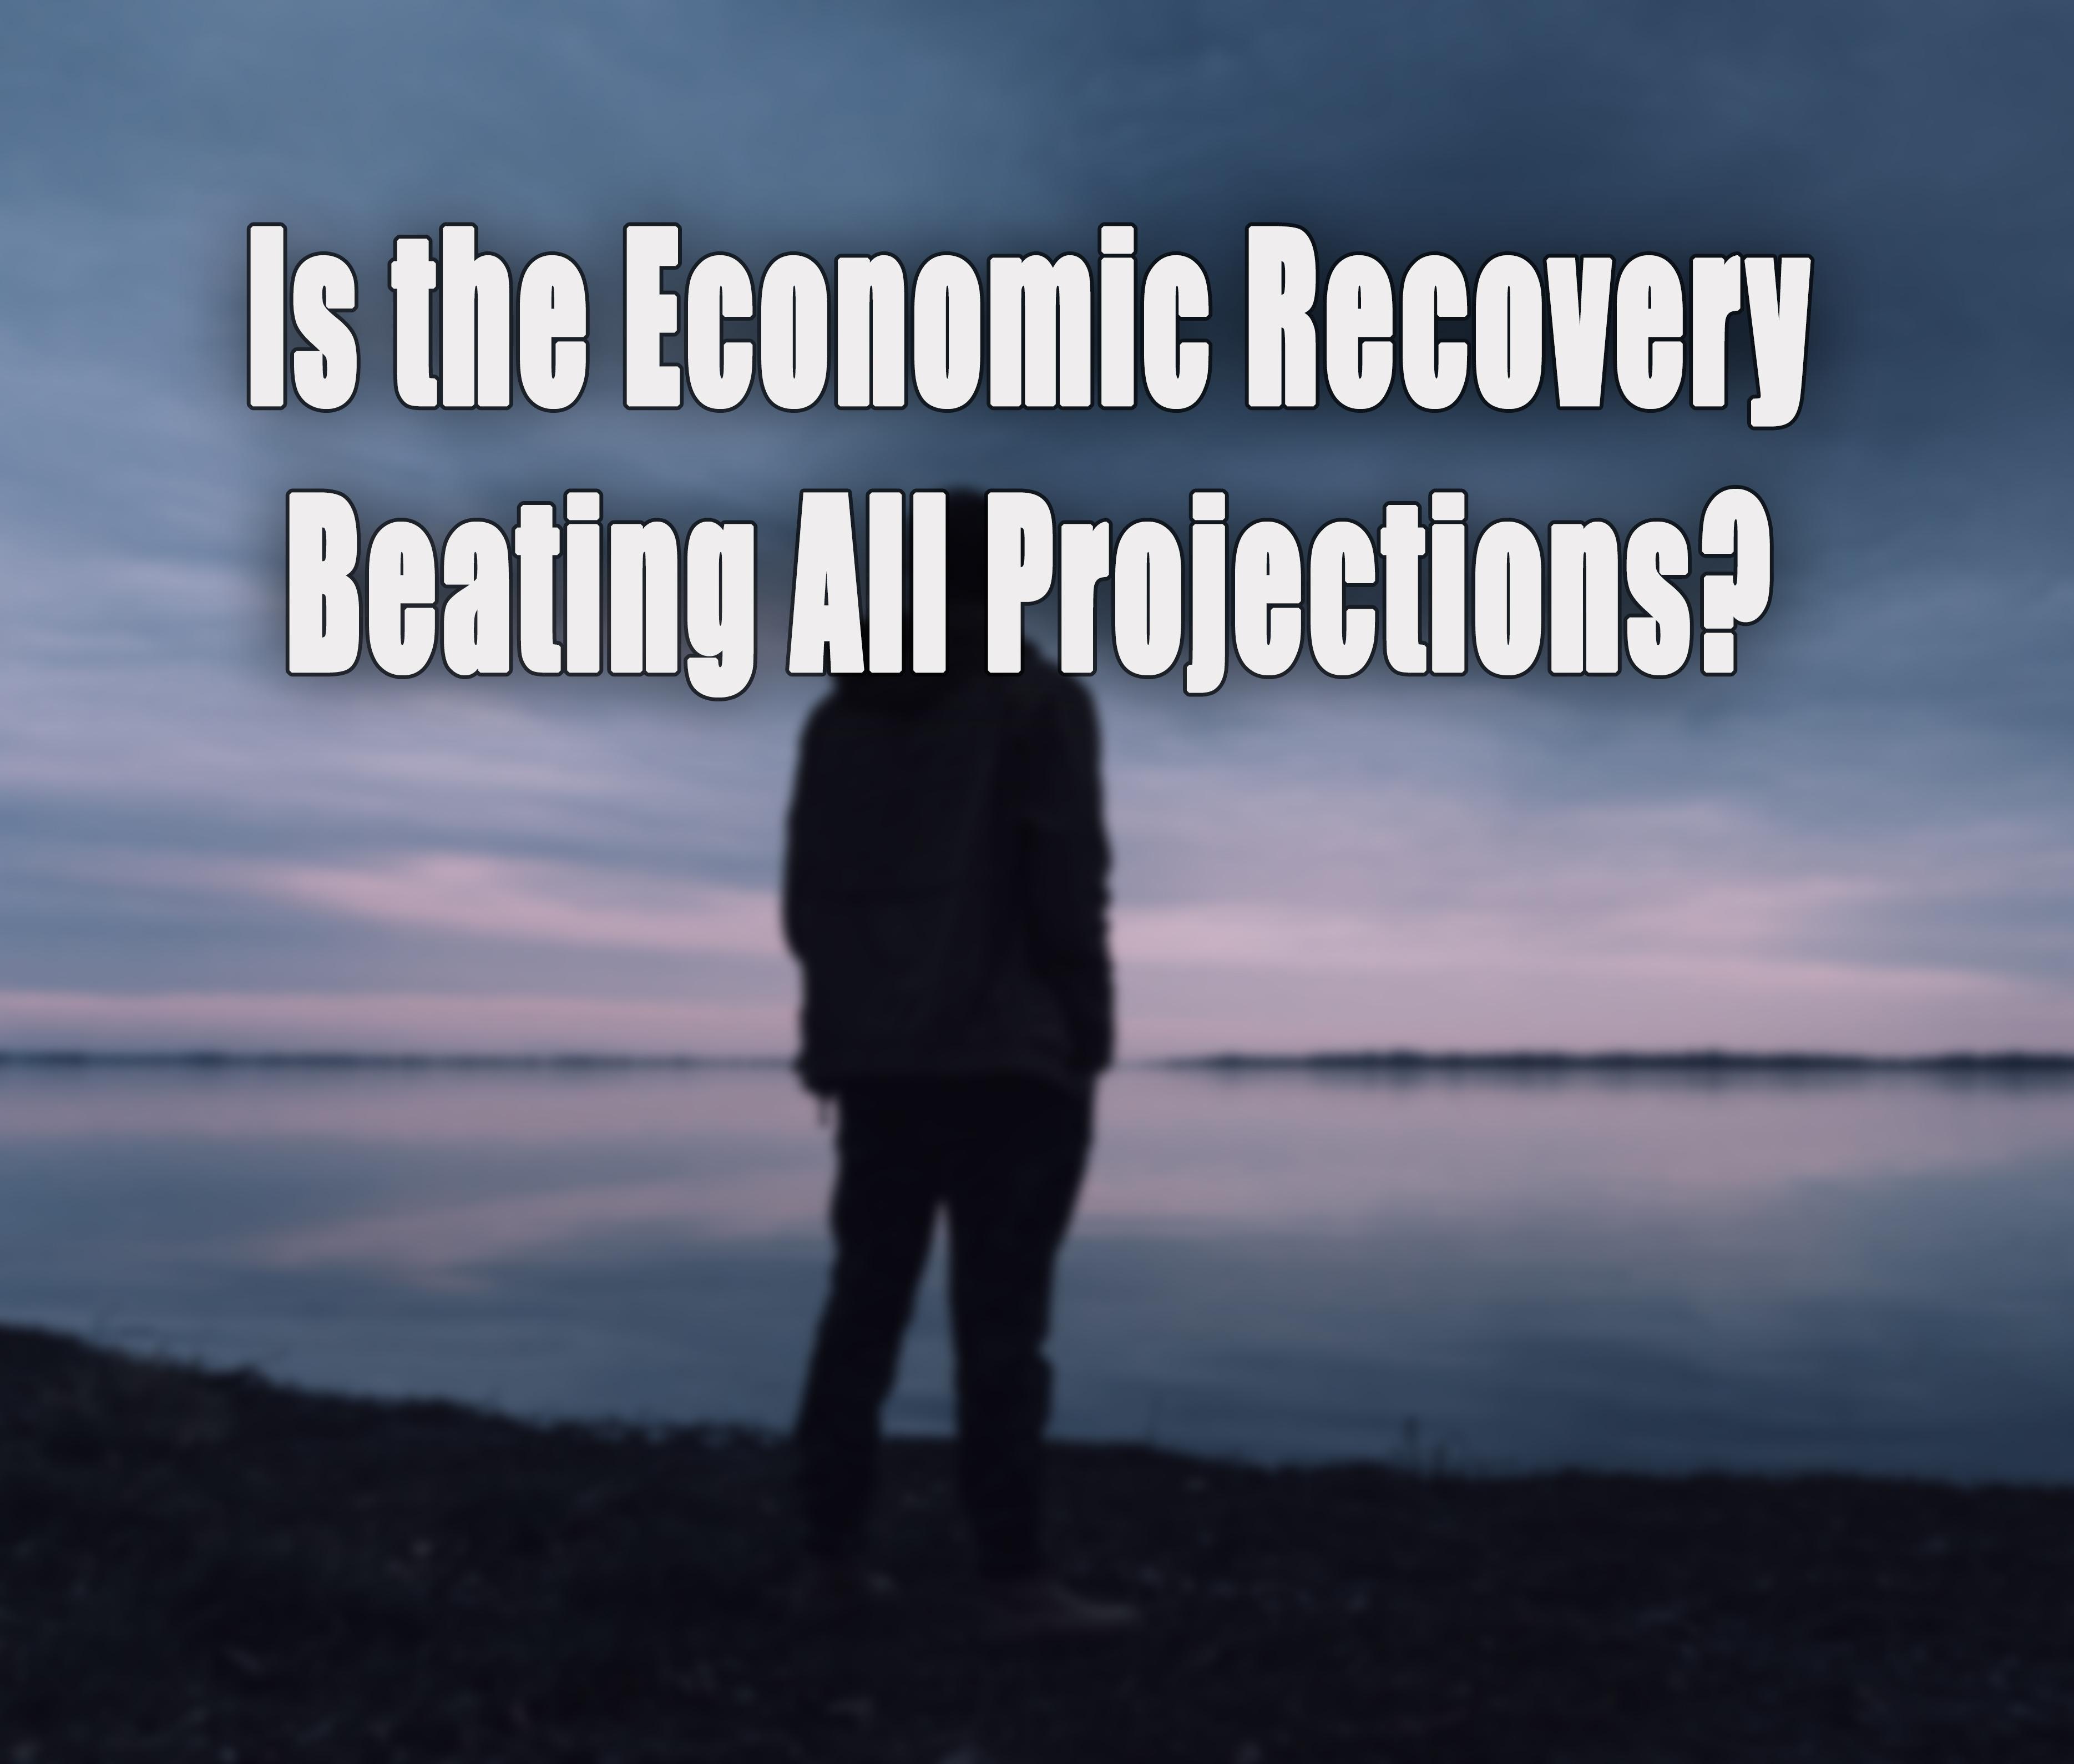 Economic Recovery in Las Vegas.jpg